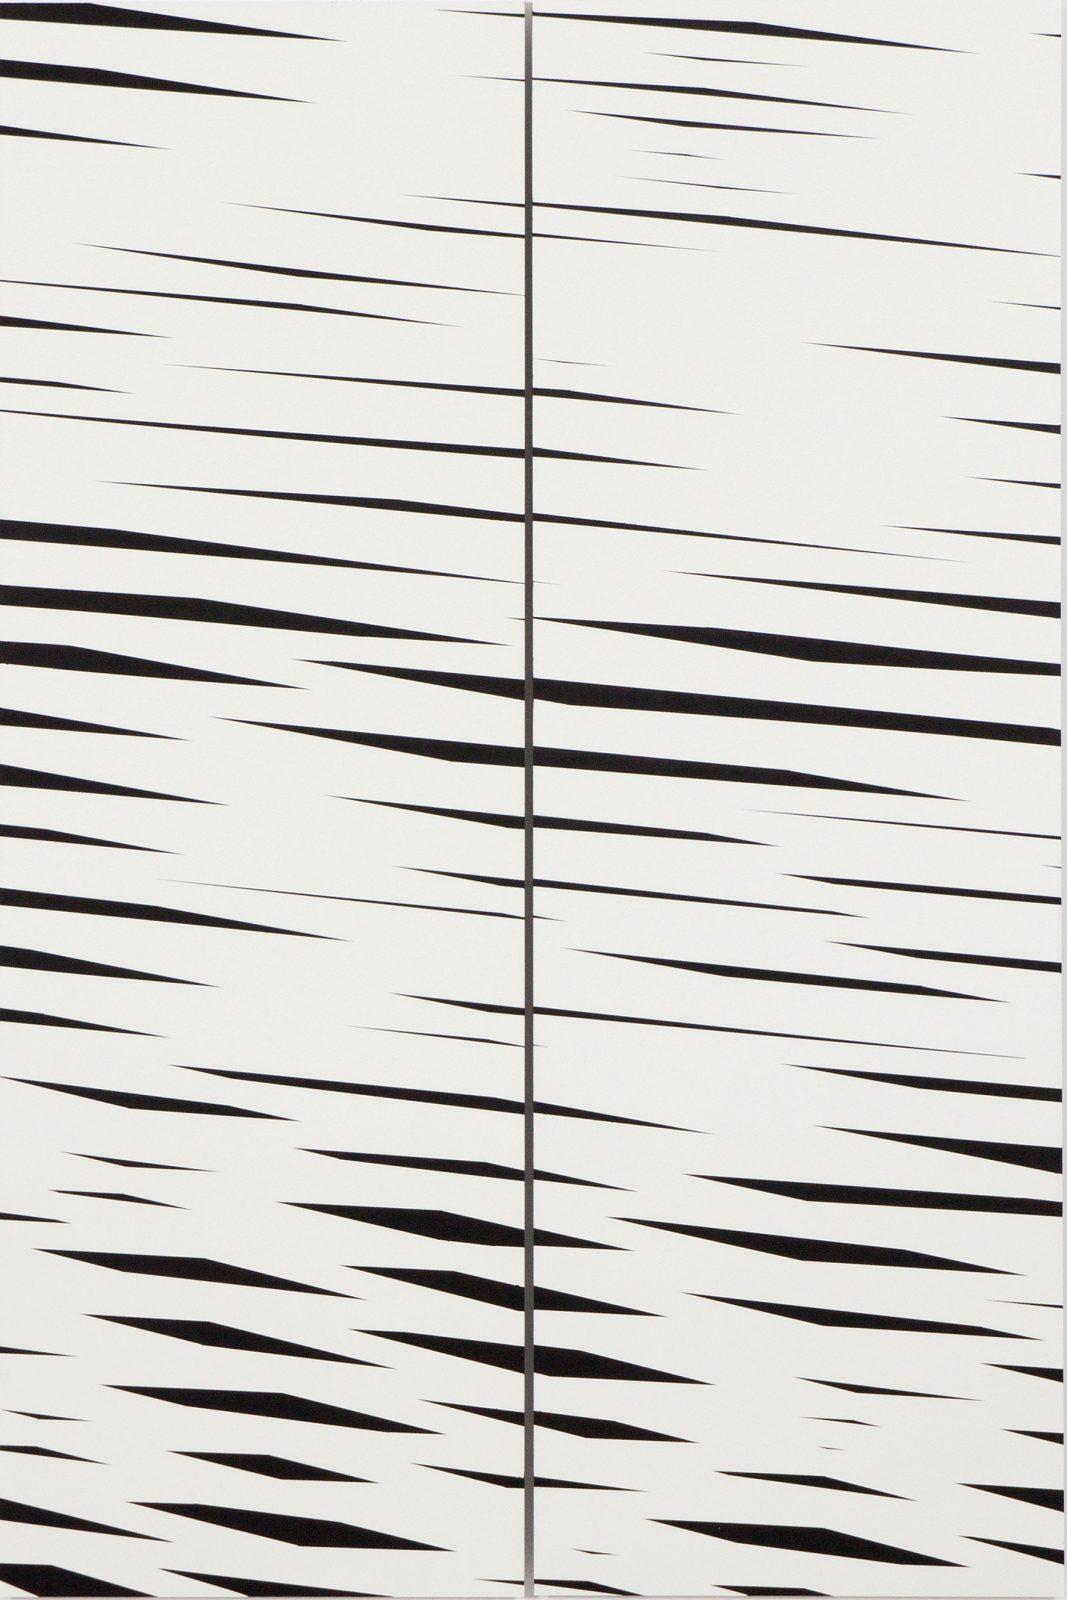 NÖ Waldviertel Galerie Kunst - blaugelbezwettl: Barbara Höller